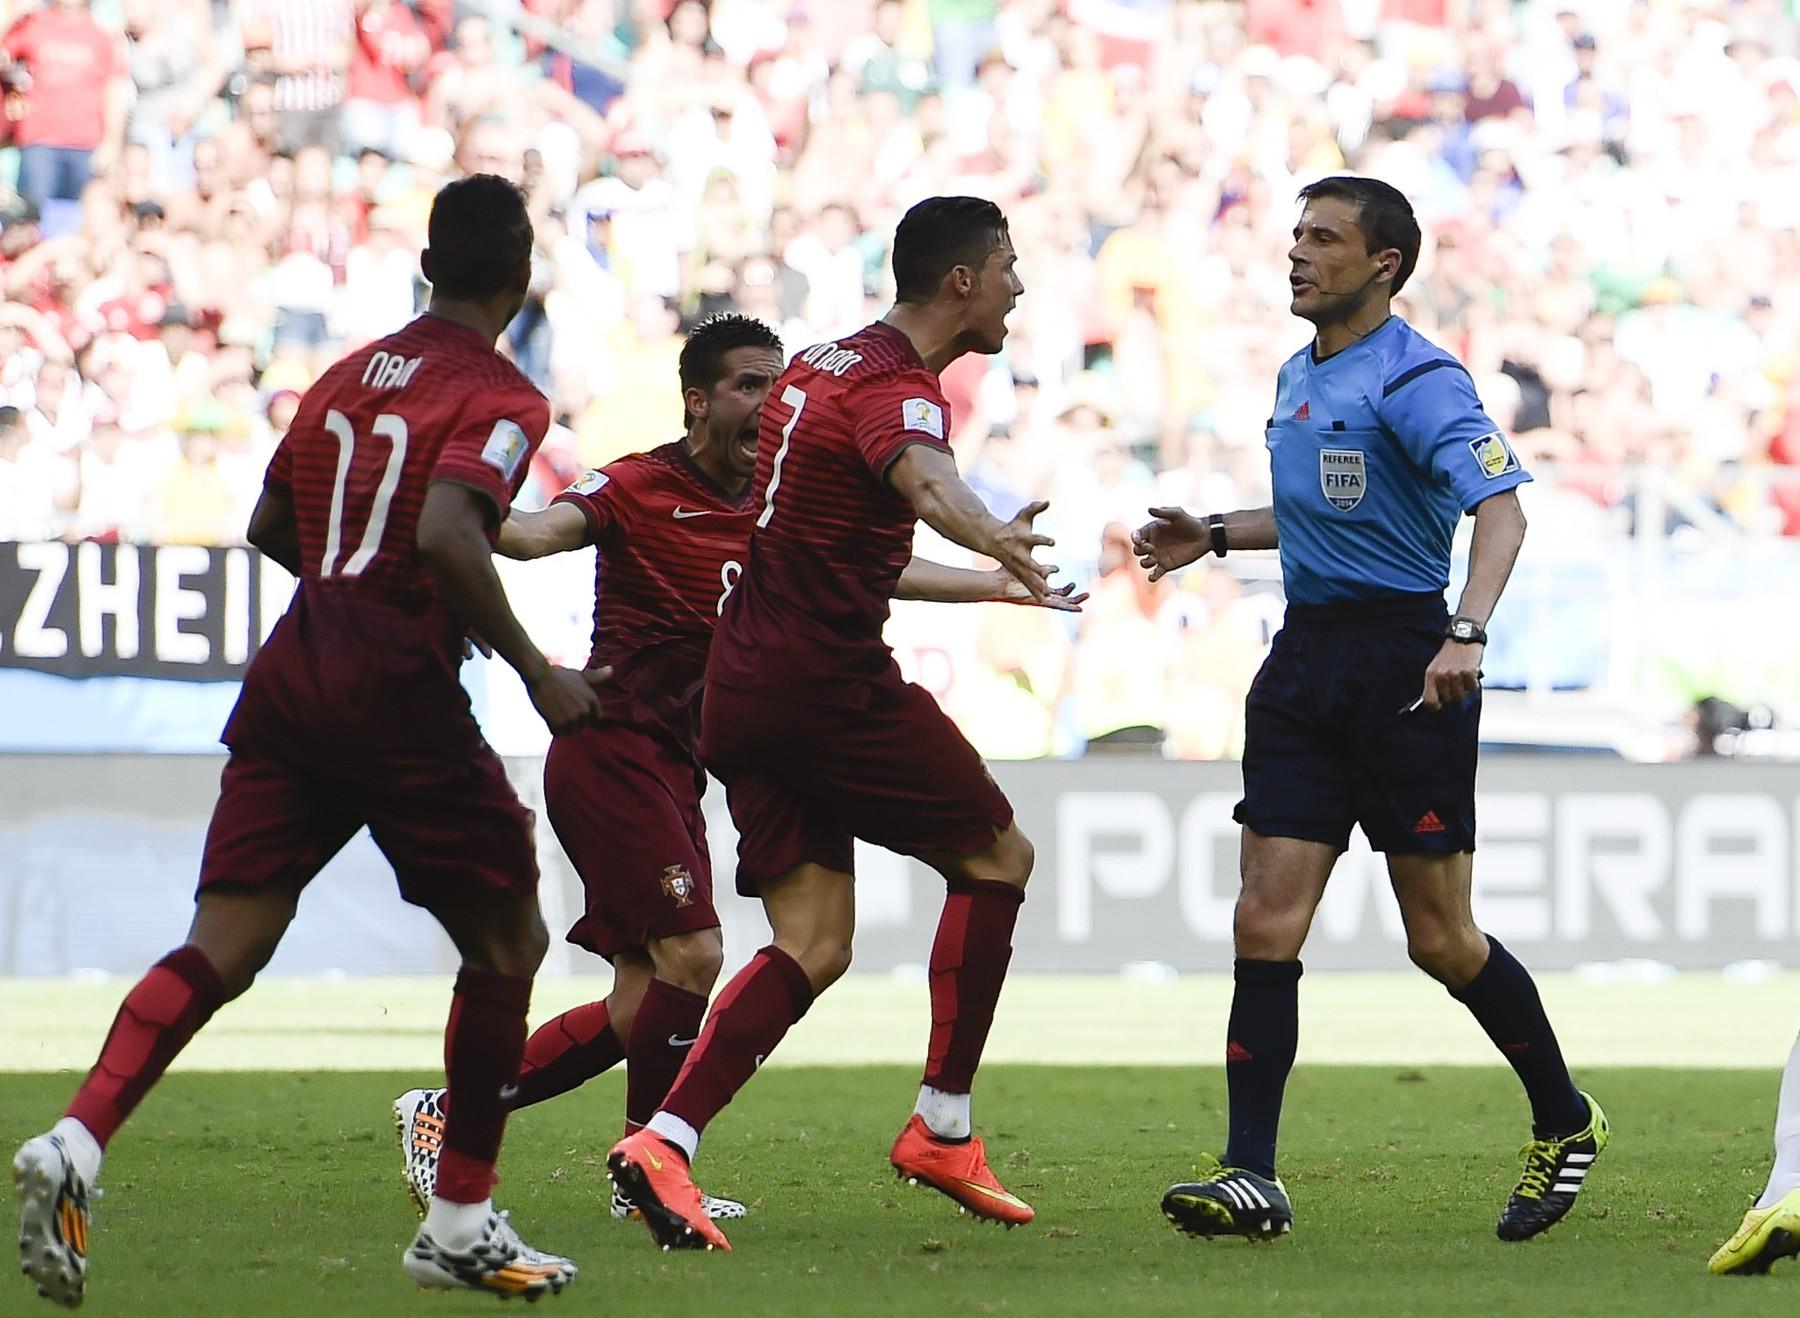 Milorad Mažić, Kristijano Ronaldo